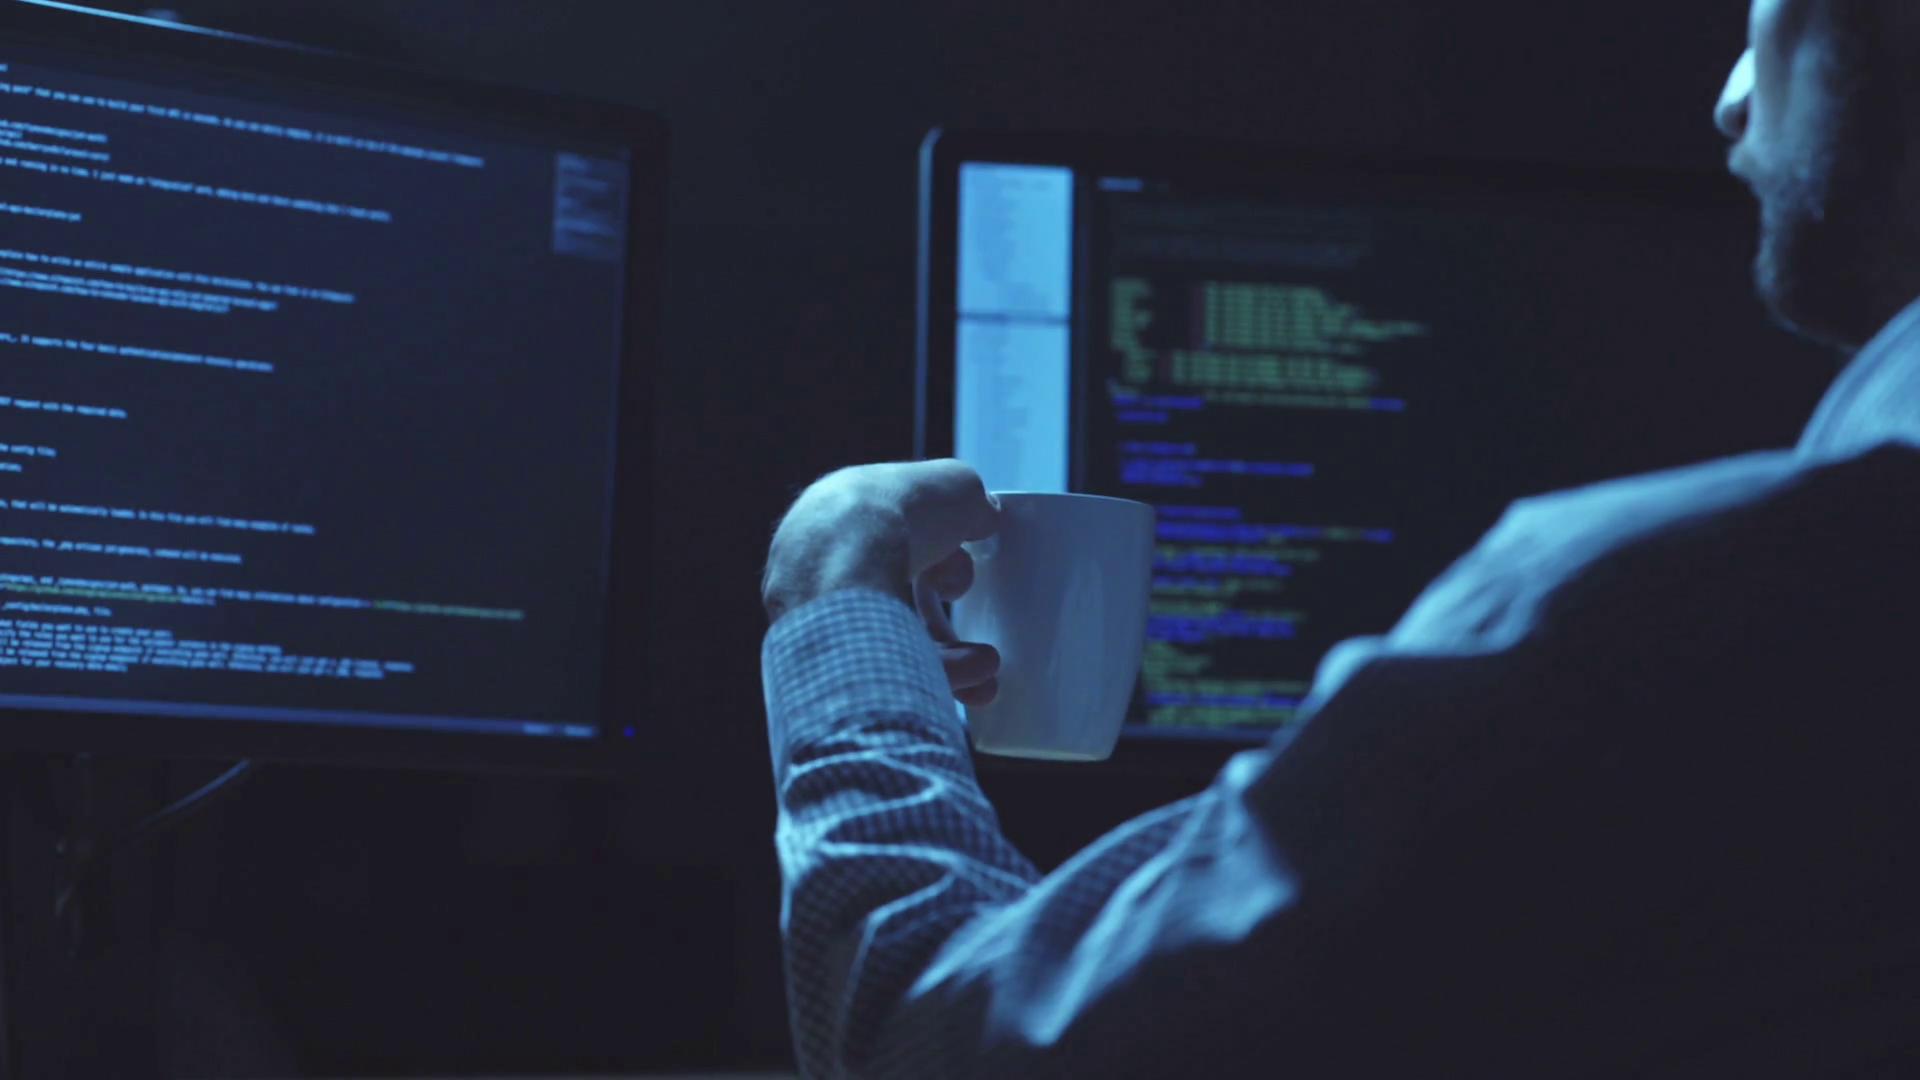 videoblocks-professional-programmer-writing-a-programming-code_r6gocwv-kz_thumbnail-full01